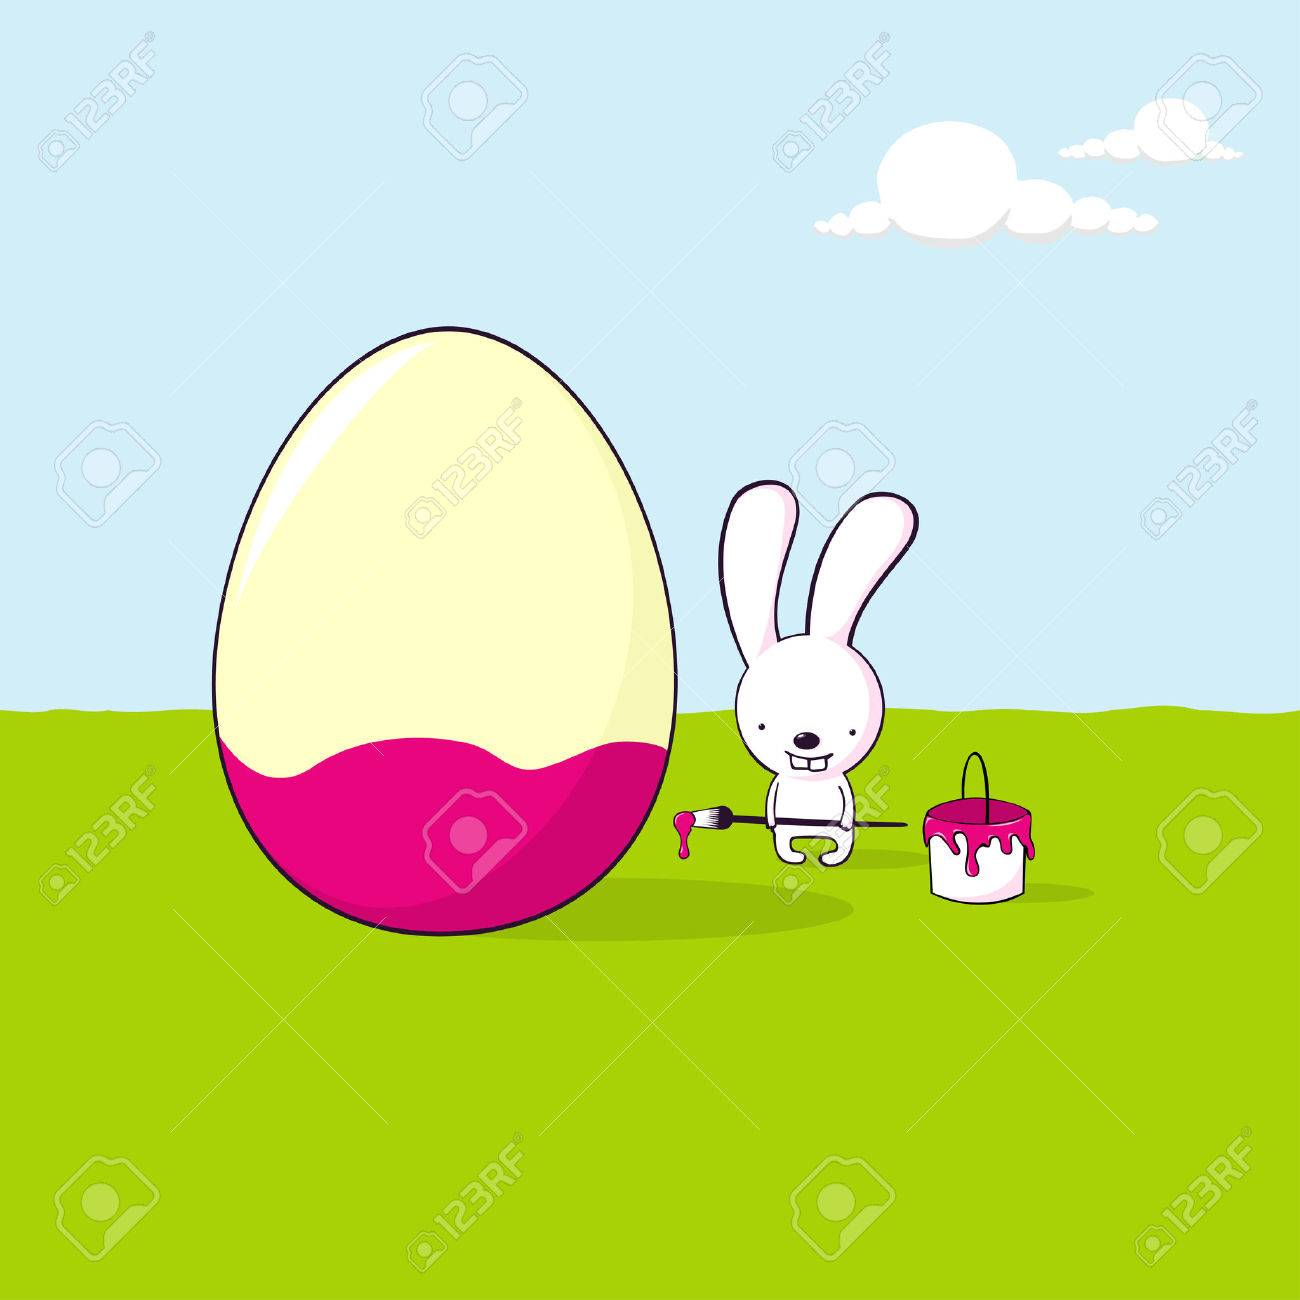 cute cartoon bunny painting an egg for Easter Stock Vector - 8639900